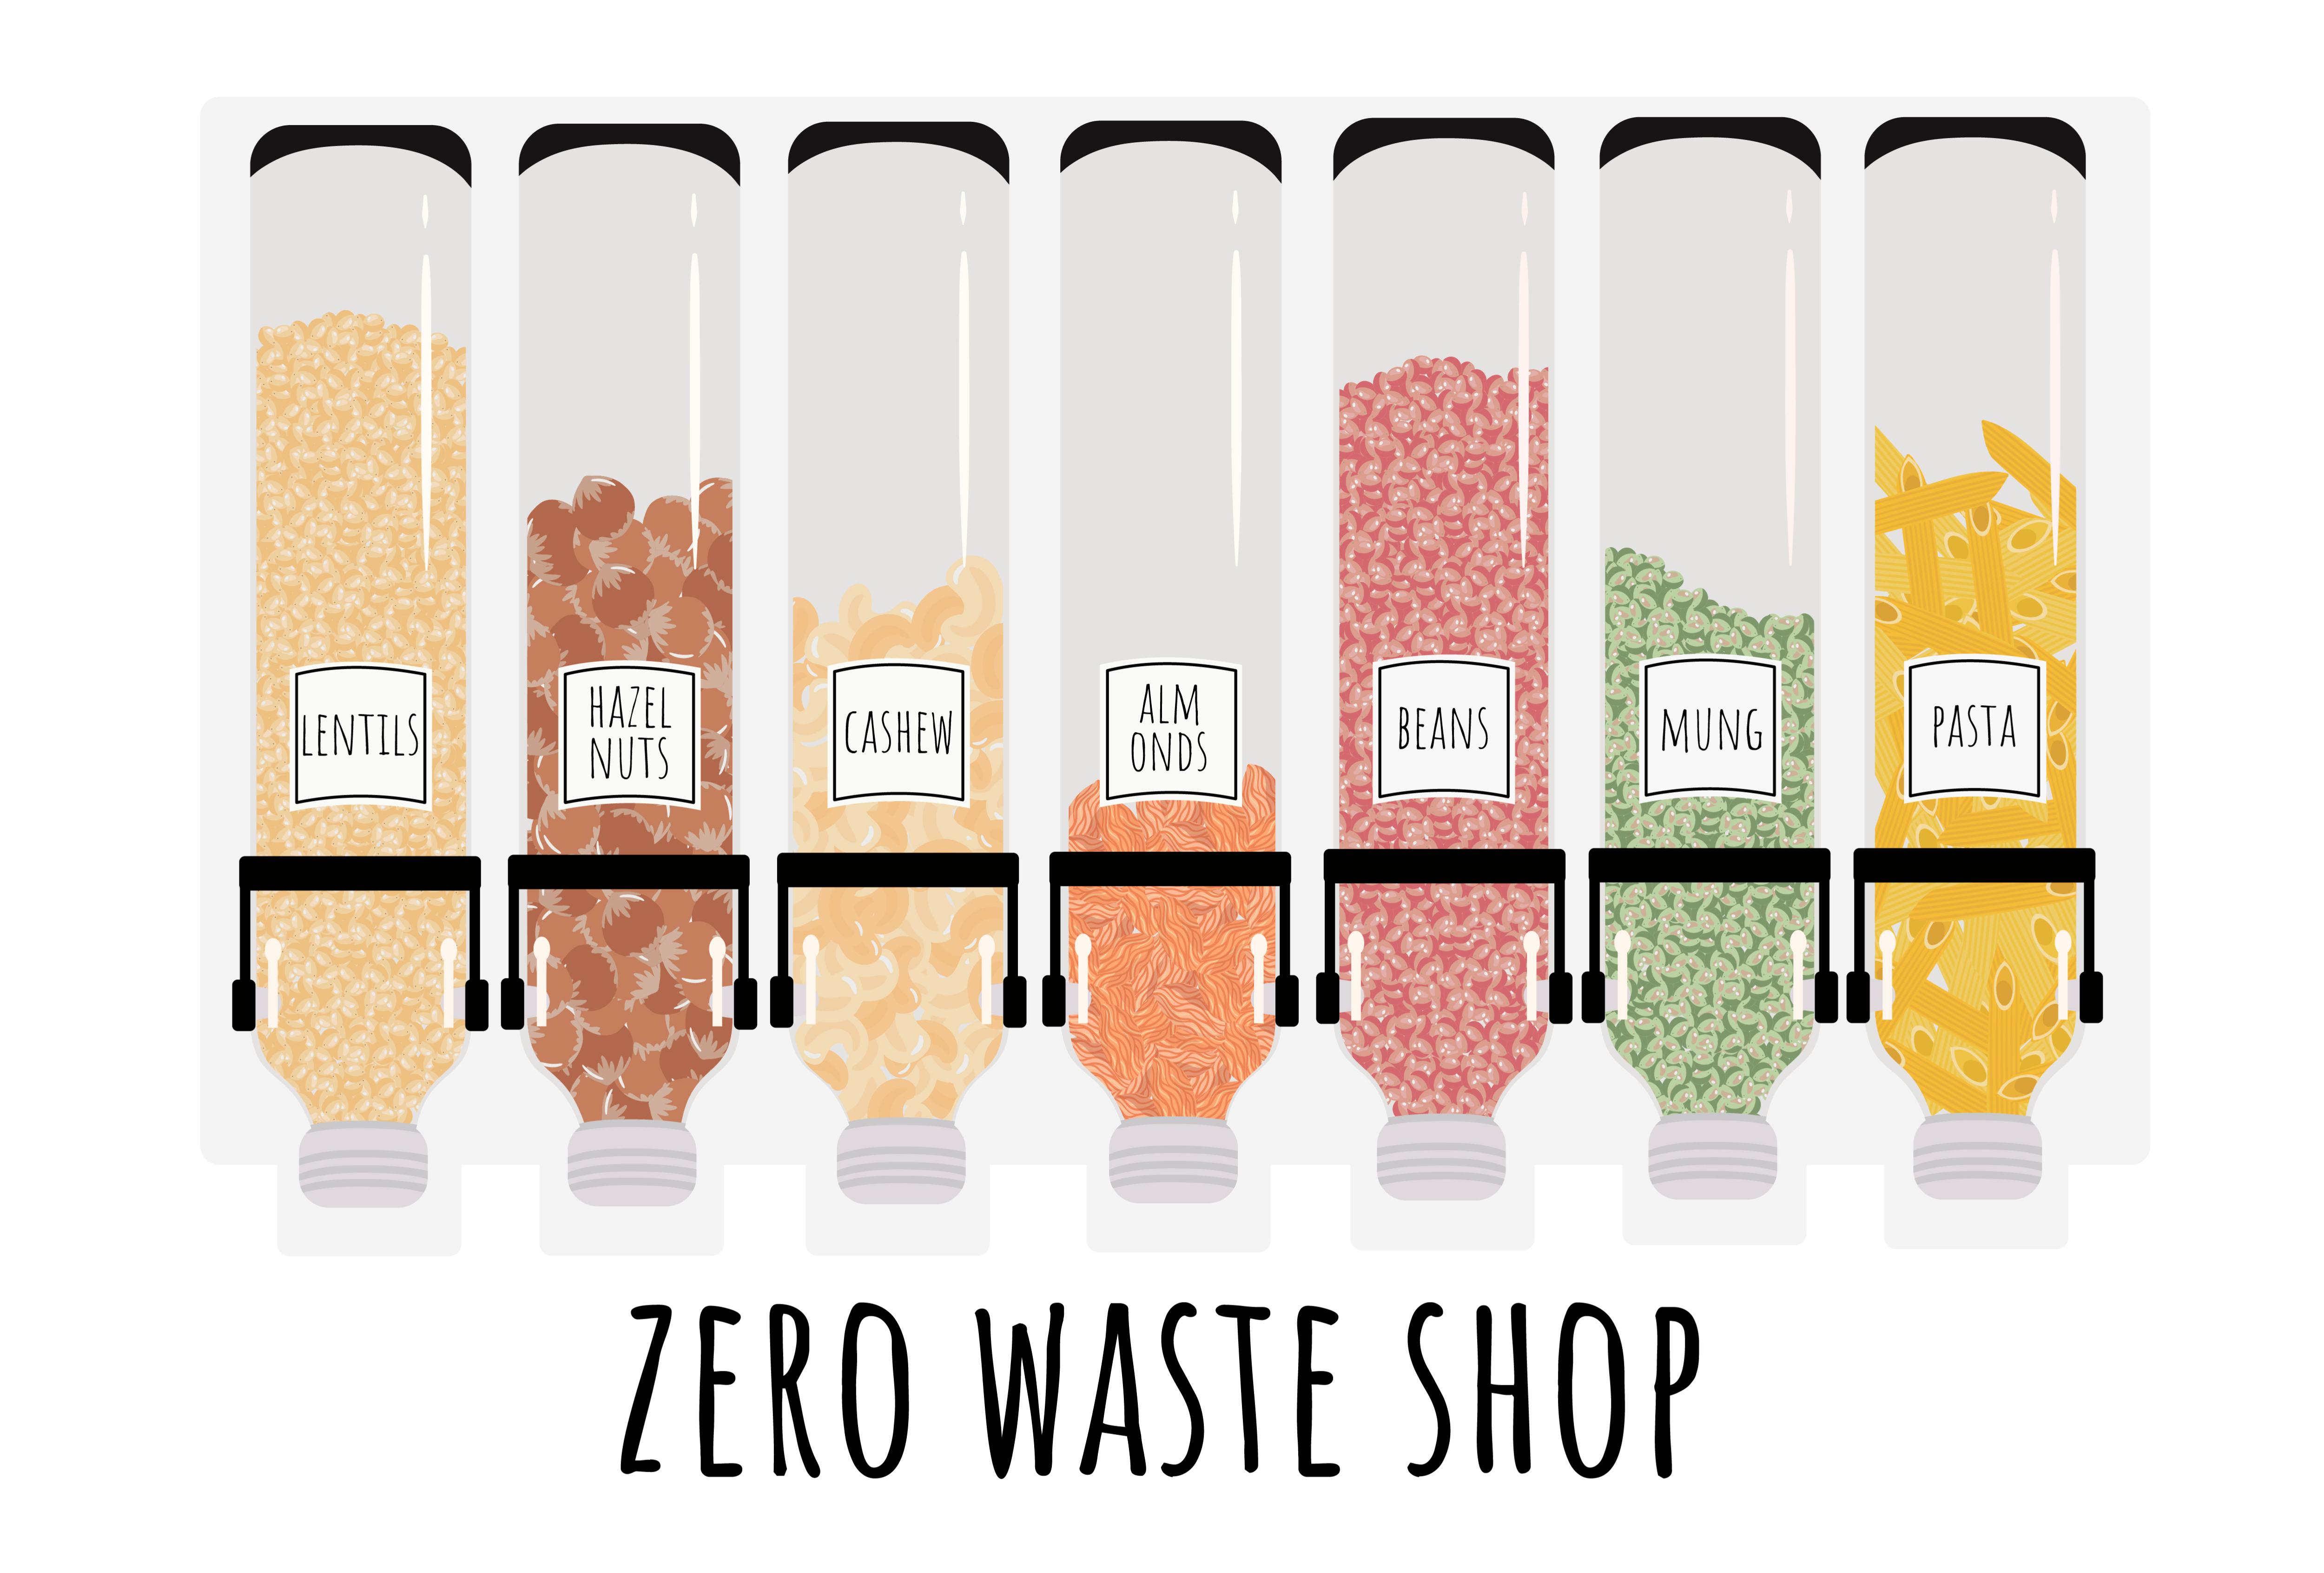 Supermarkets Face Backlash as War on Plastic Rages on